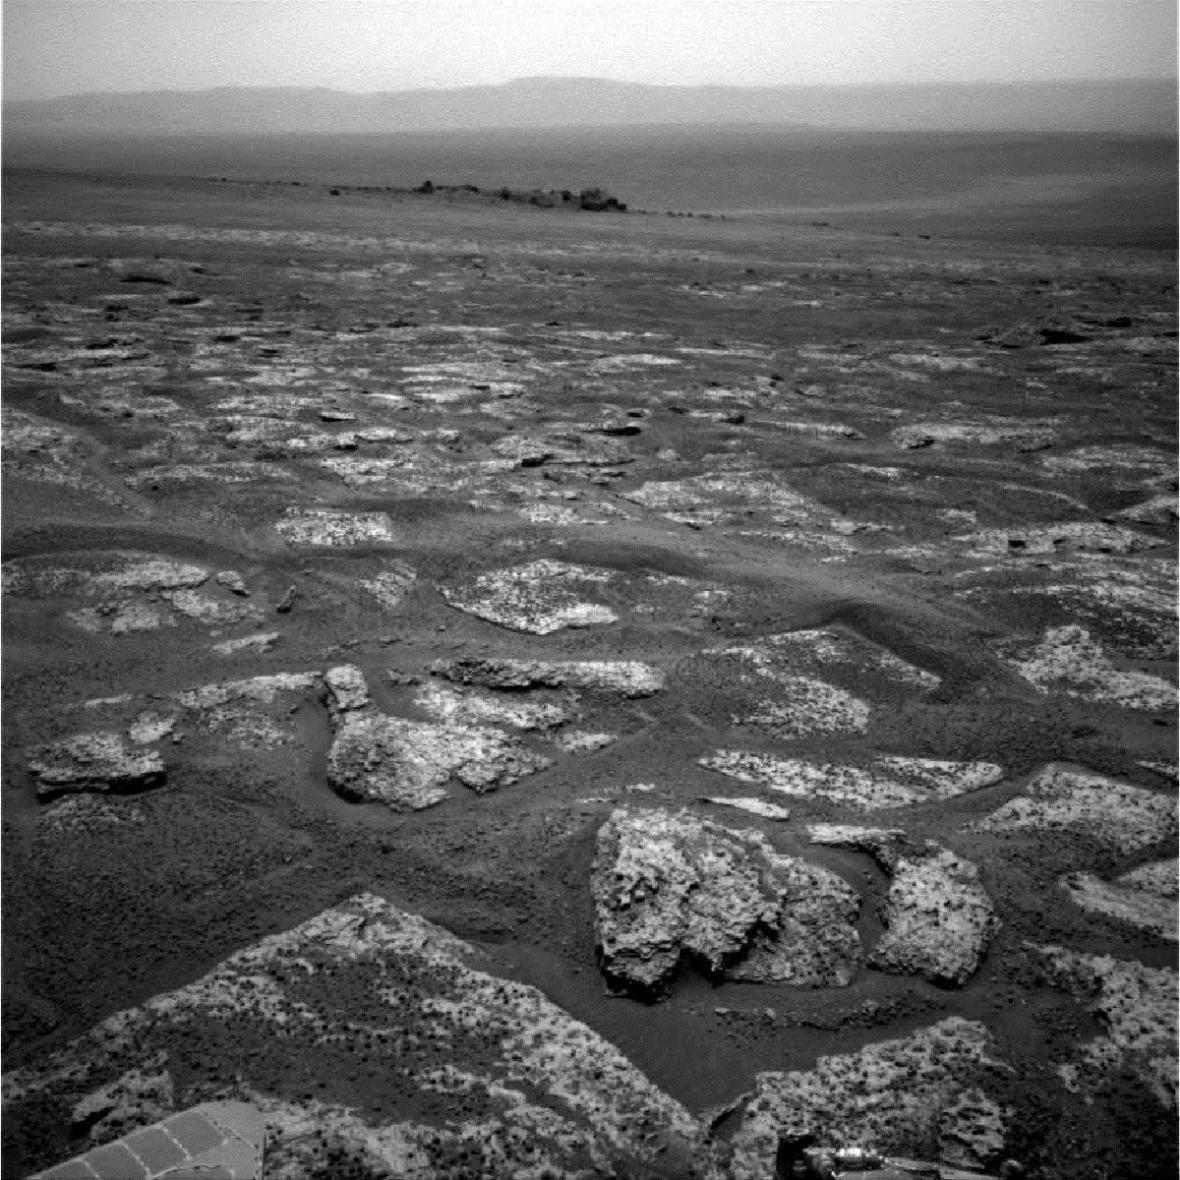 Kráter Endeavour